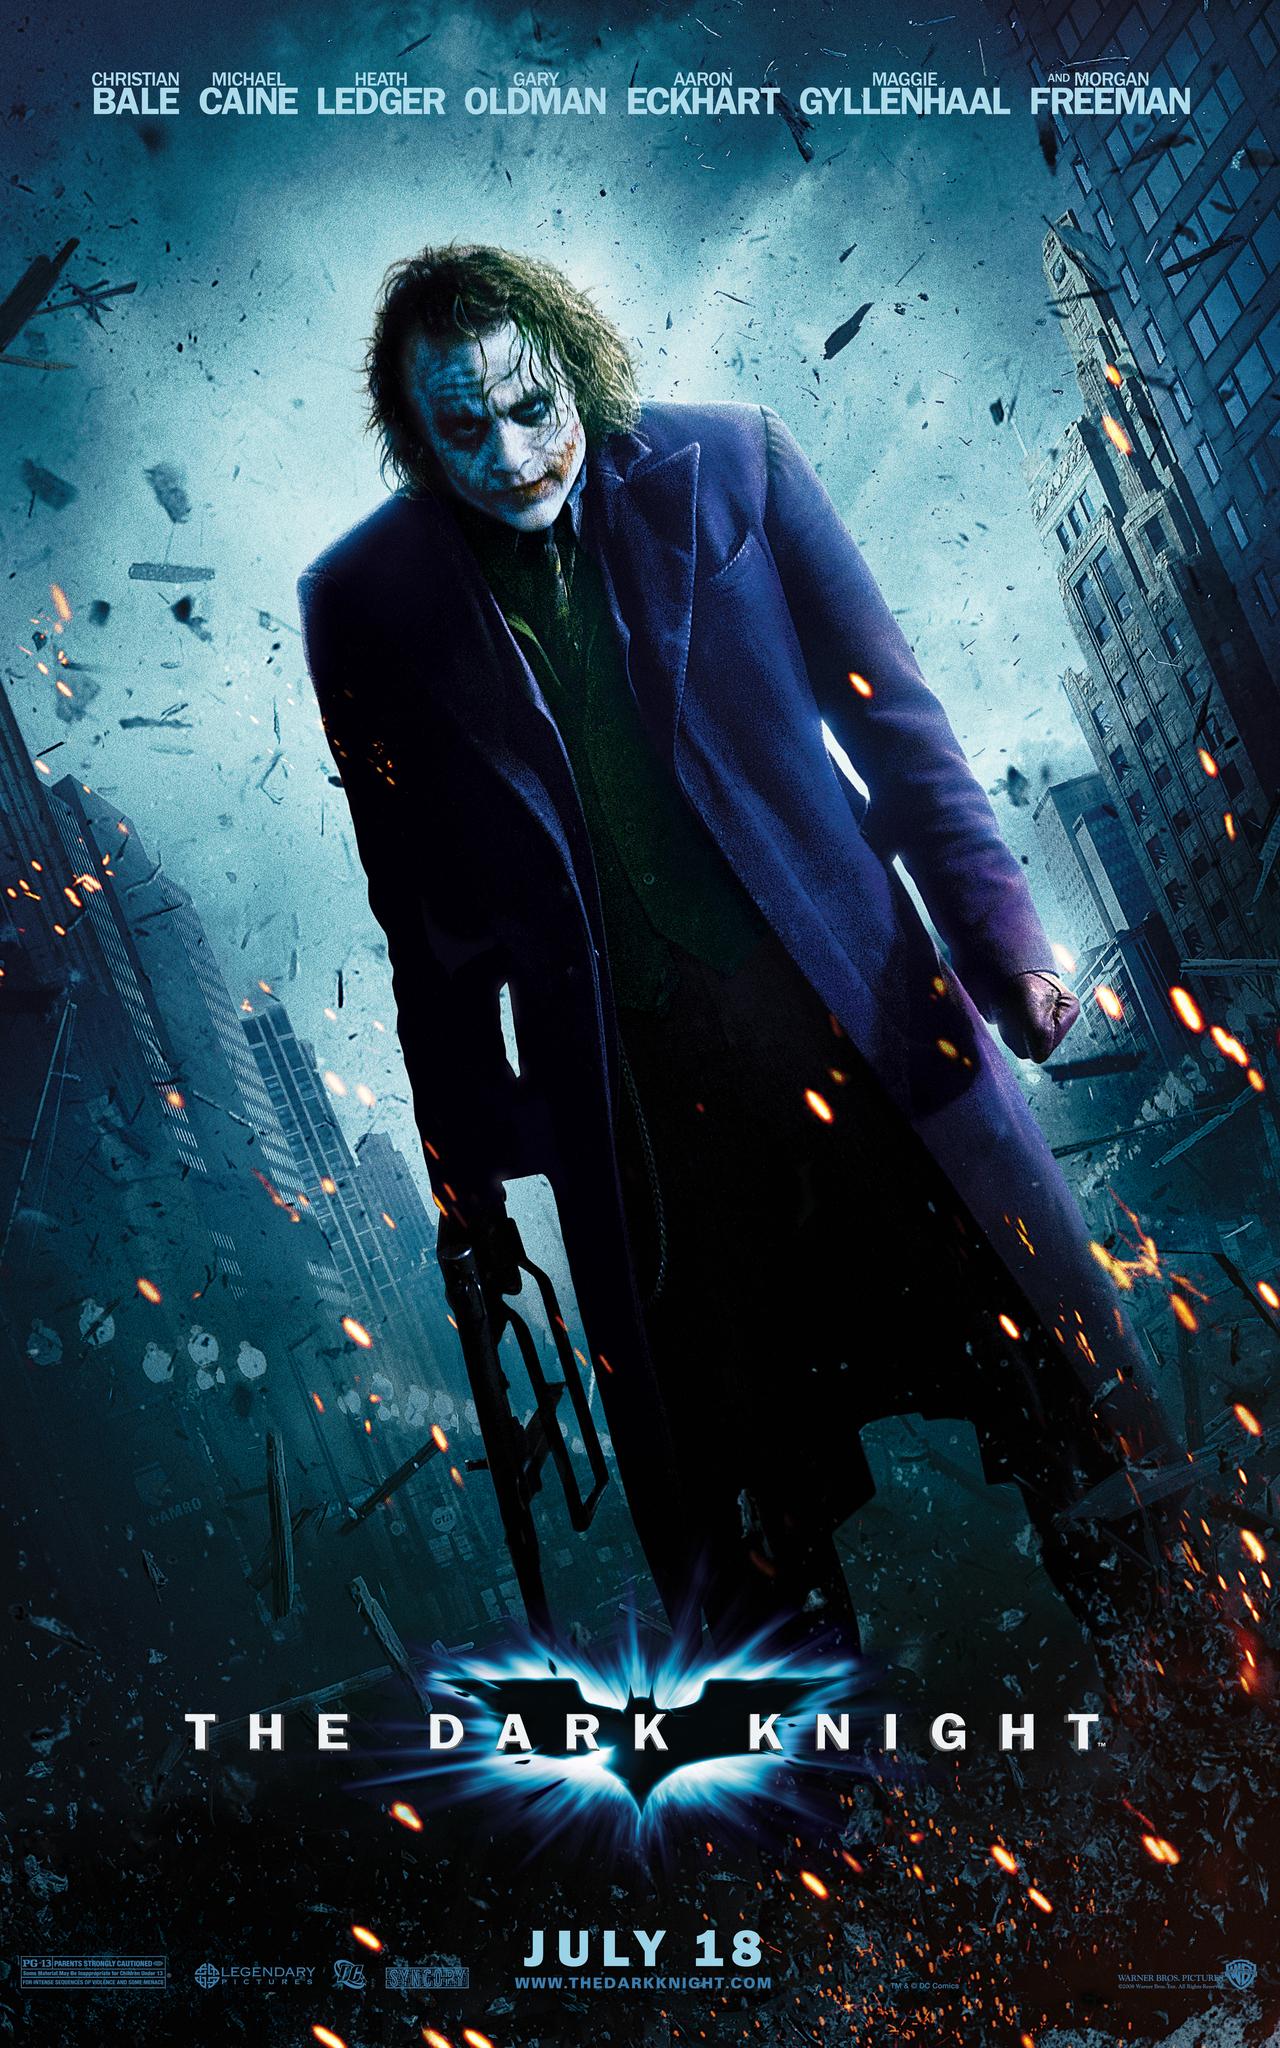 The Dark Knight 2008 Gallery IMDb